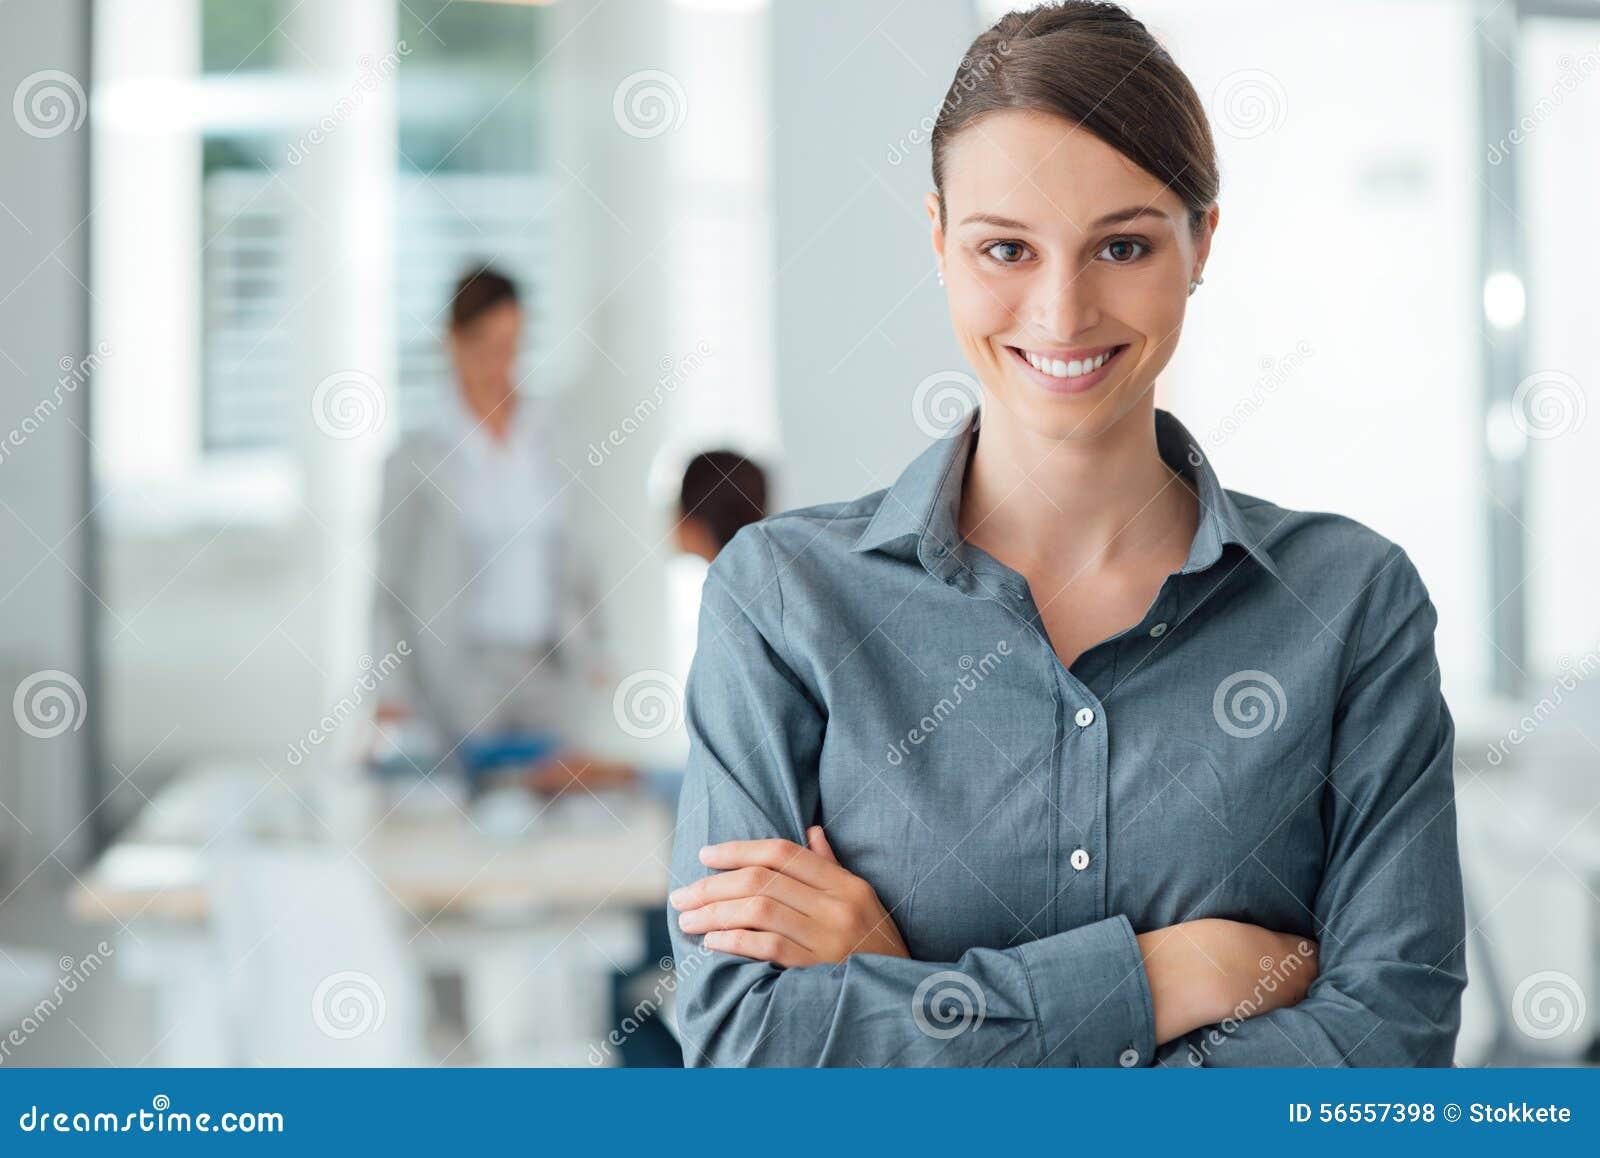 Download Πορτρέτο εργαζομένων γραφείων χαμόγελου θηλυκό Στοκ Εικόνες - εικόνα από resources, έκφραση: 56557398